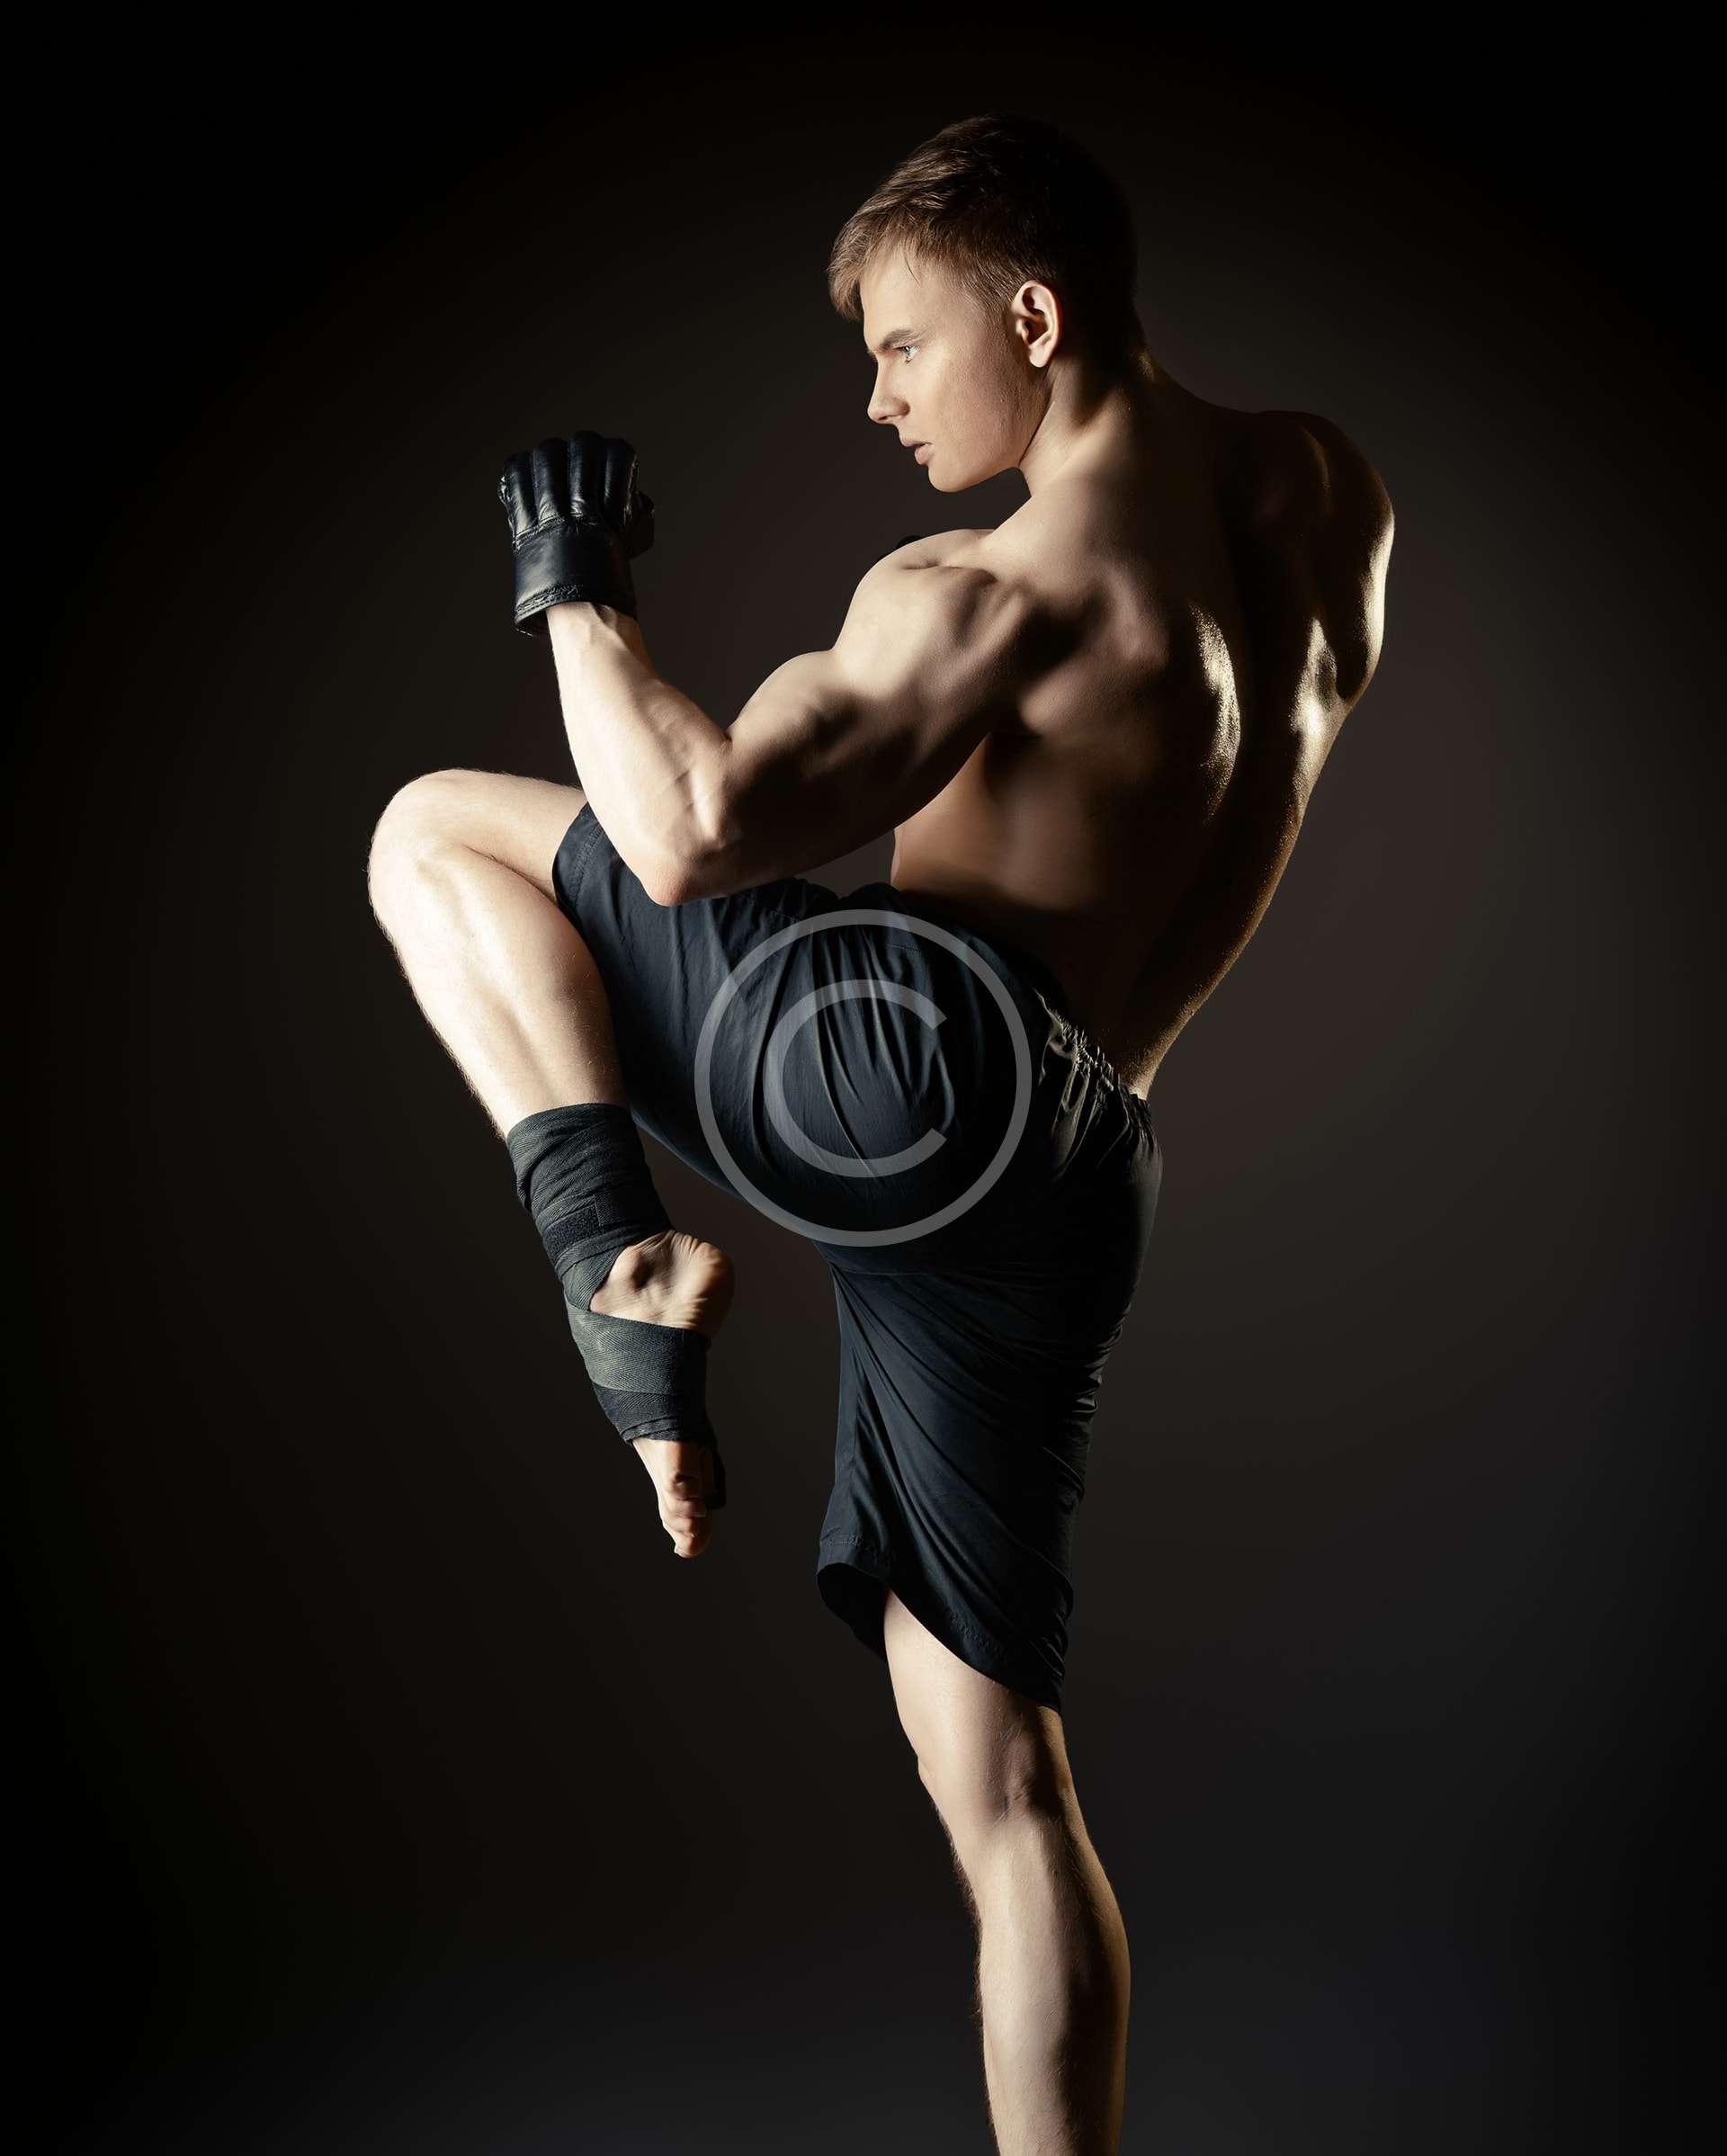 Kickboxing Exercises